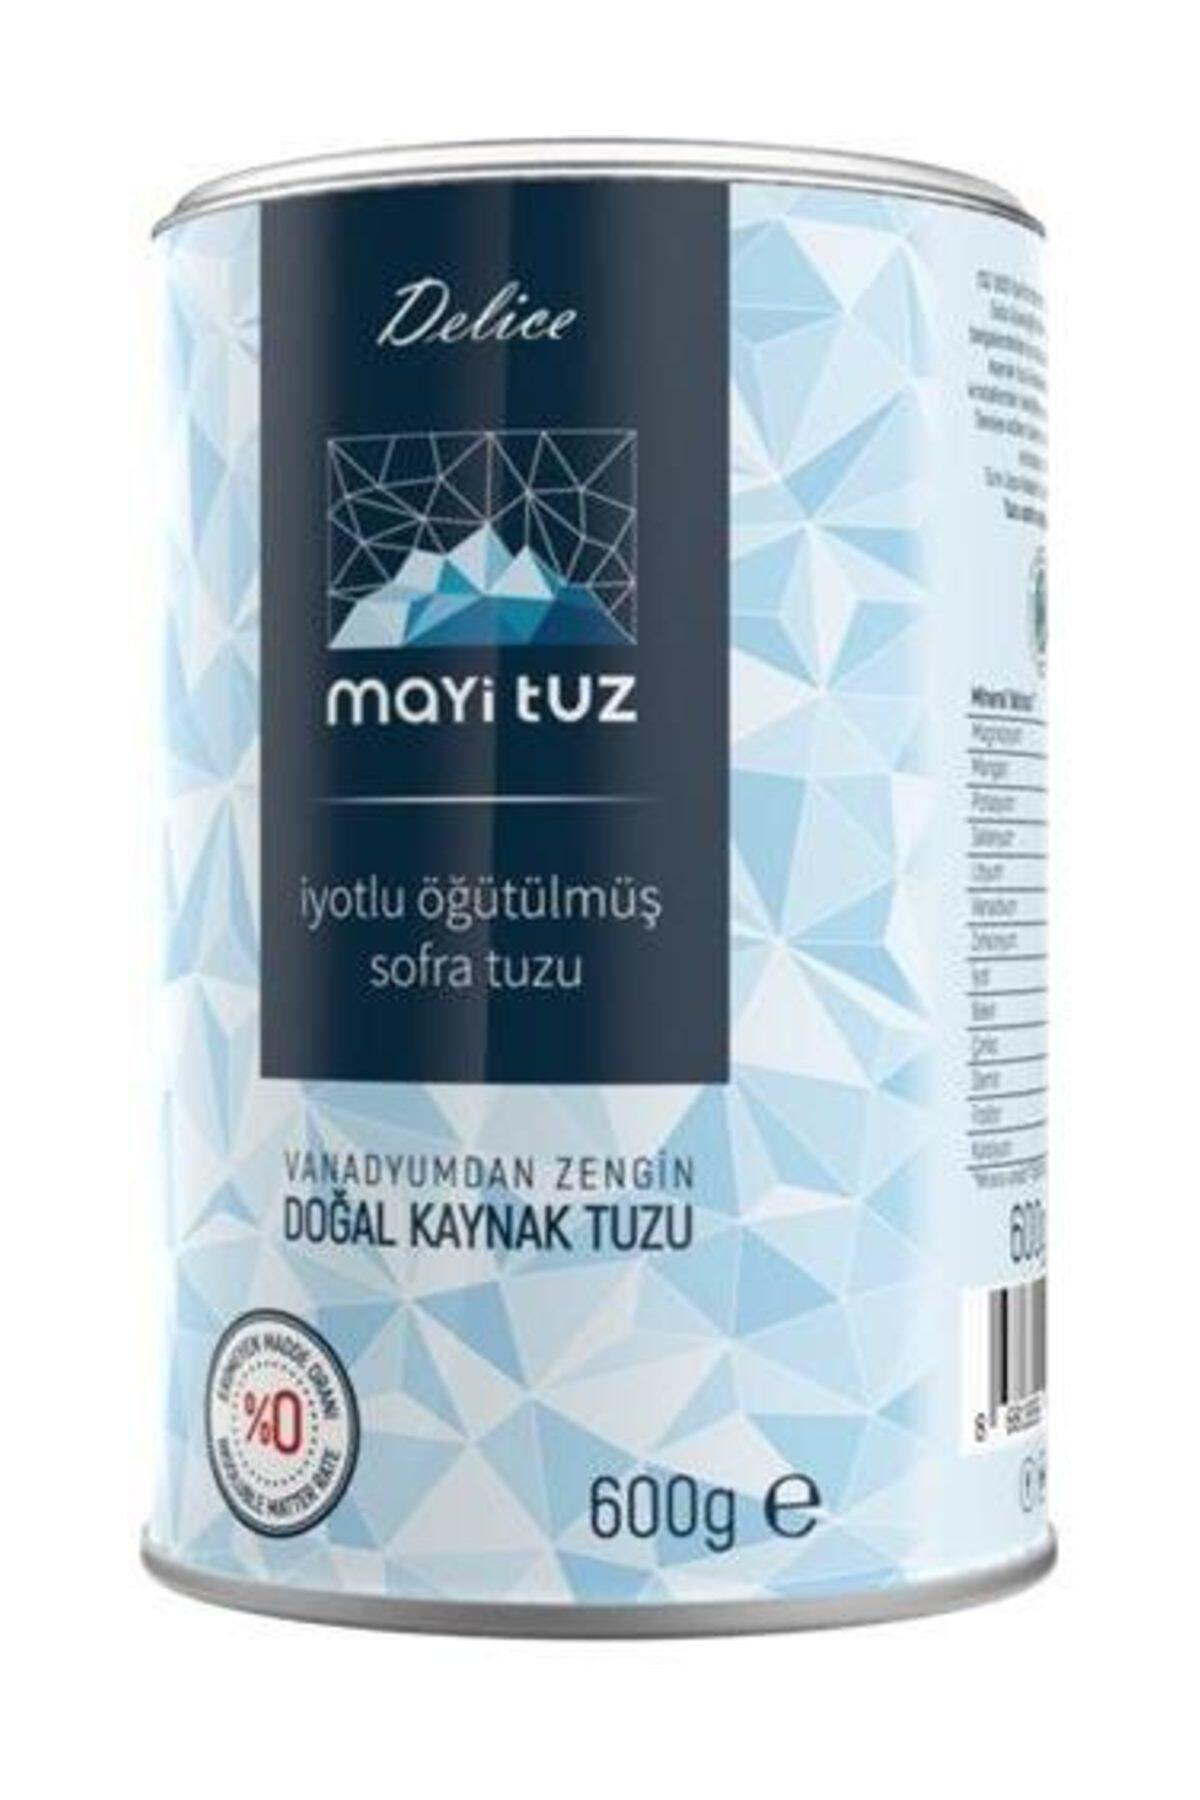 Mayi Tuz Mayituz Delice Iyotlu Ince Kaynak Tuzu 600 Gr 1